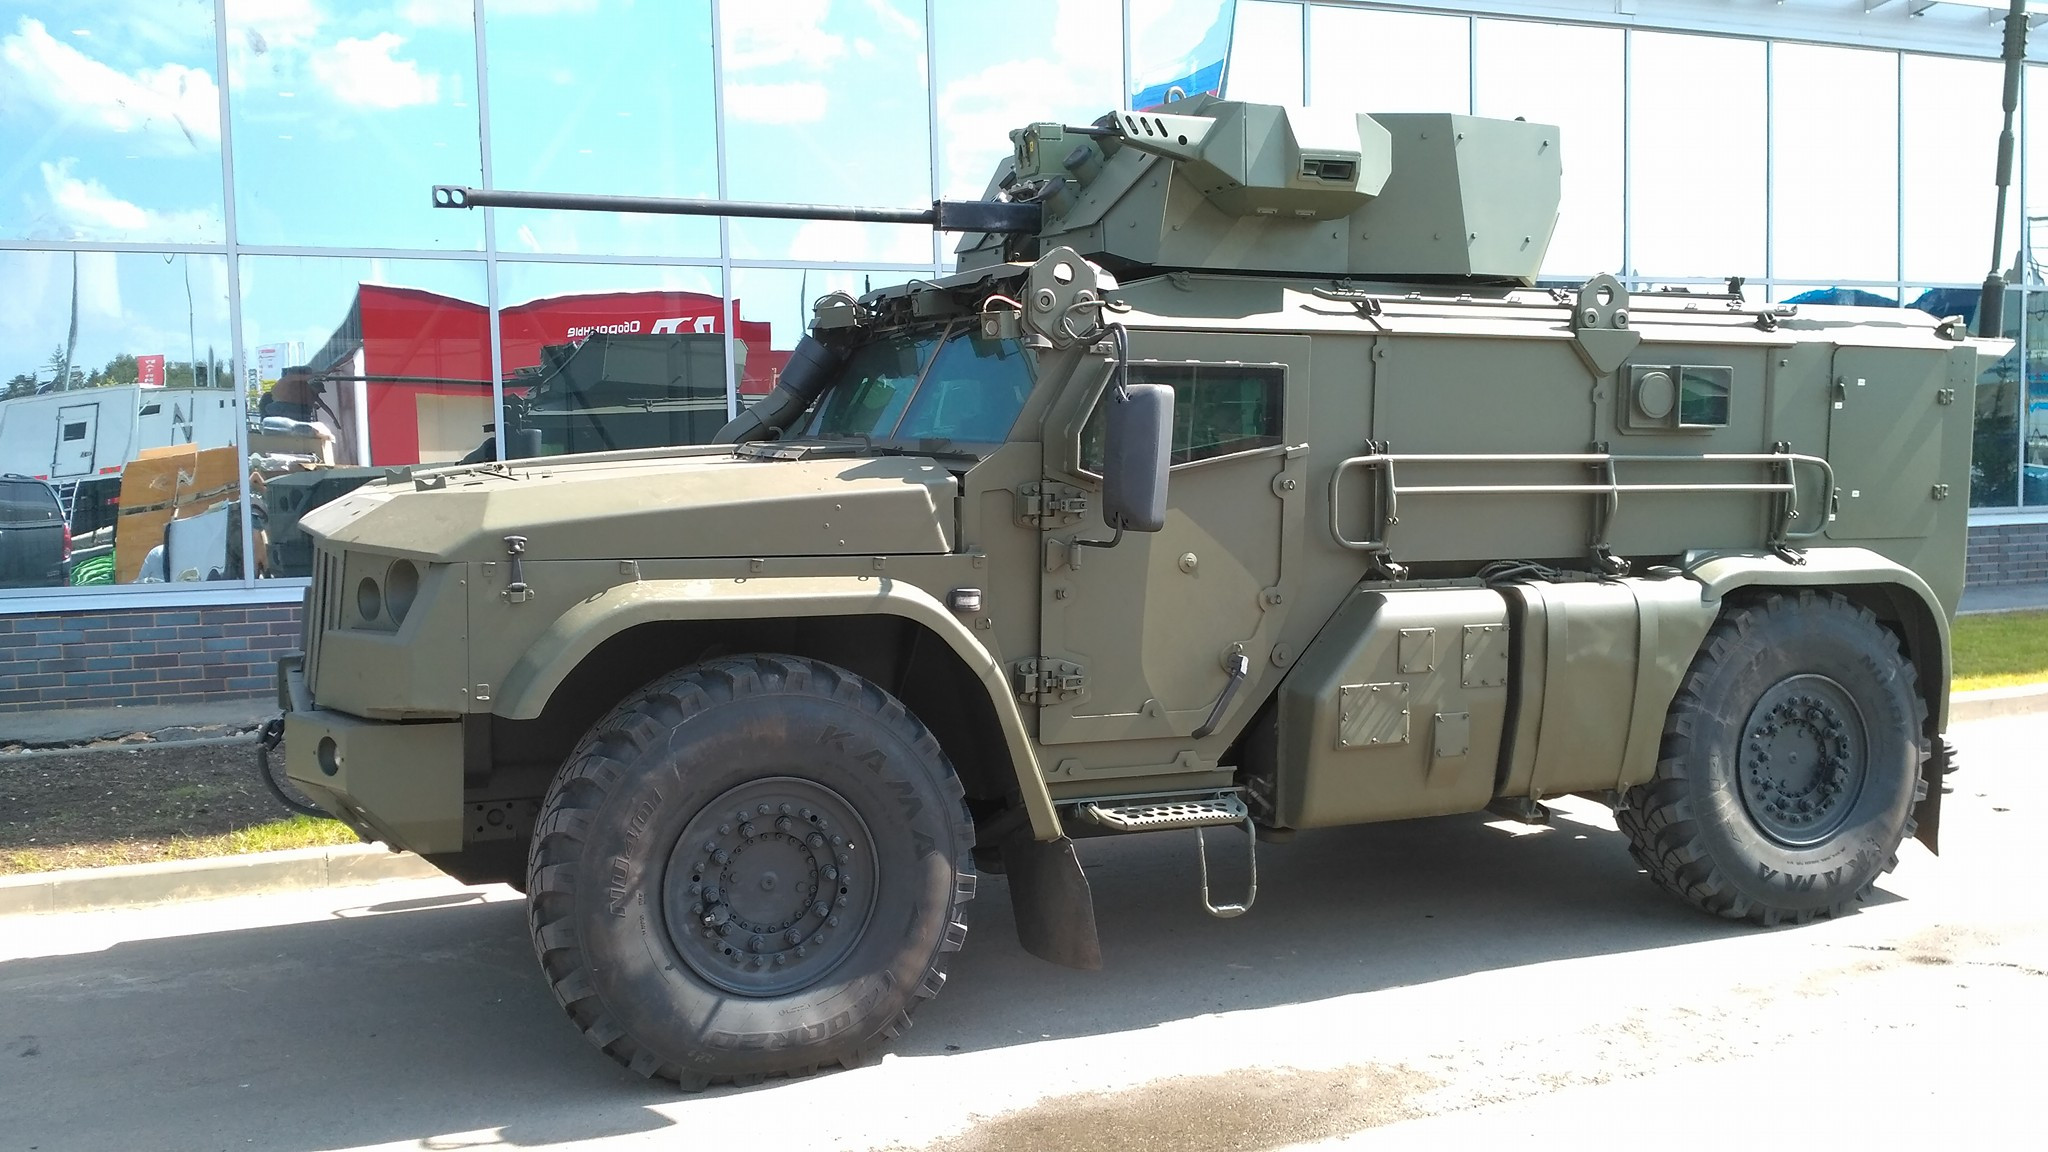 KAMAZ Typhoon / VDV 4×4 – Novo veículo para as tropas paraquedistas da Rússia